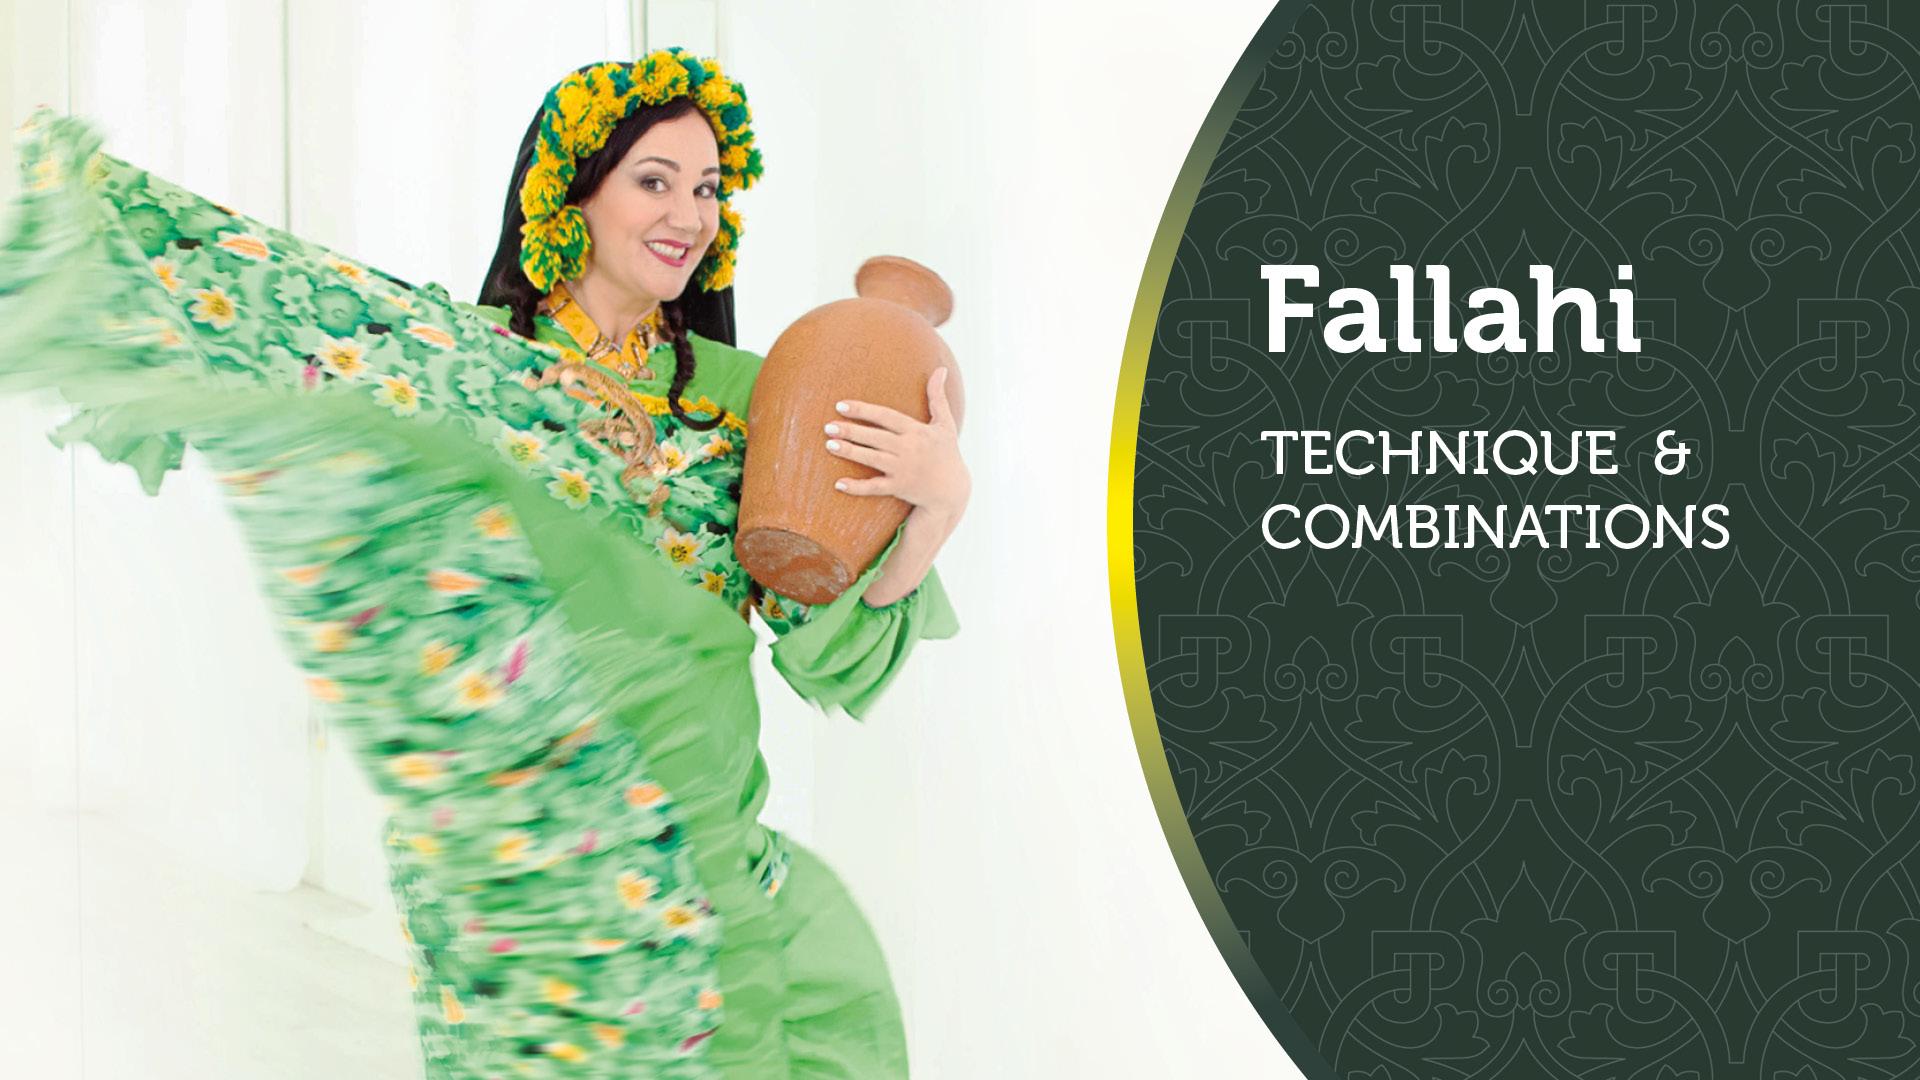 Fallahi Technique & Combinations